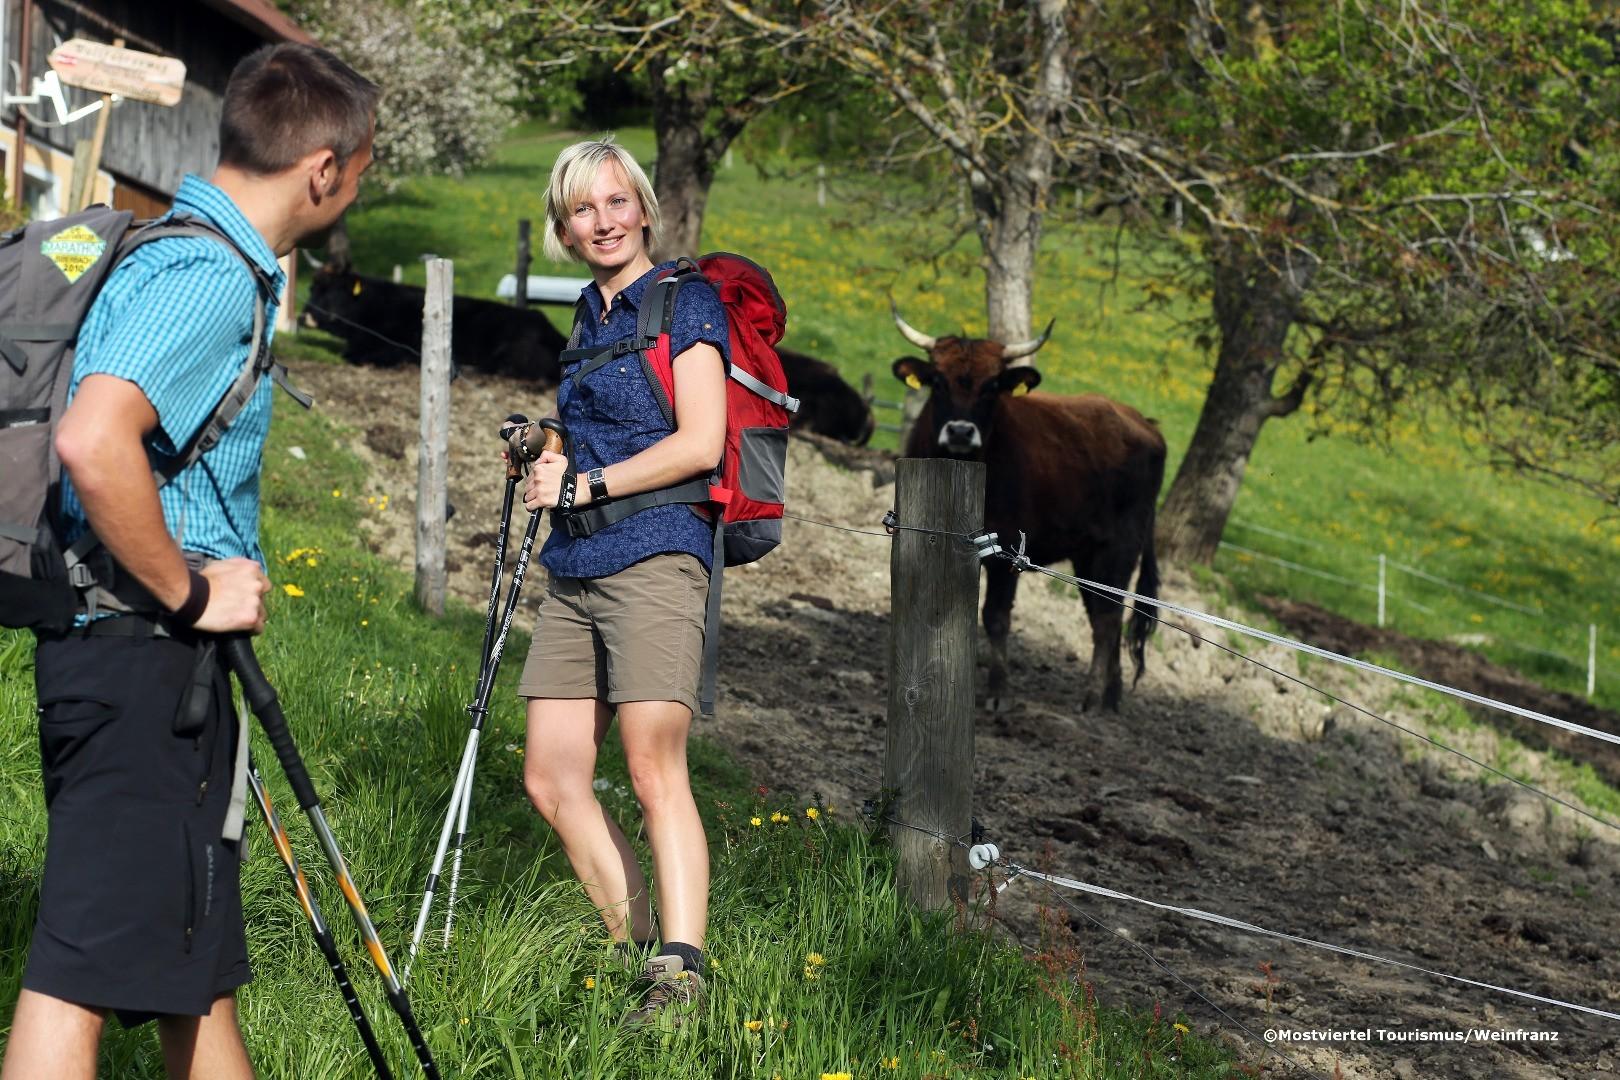 Wandern am Sonntagberg 4 - weinfranz.at.jpg